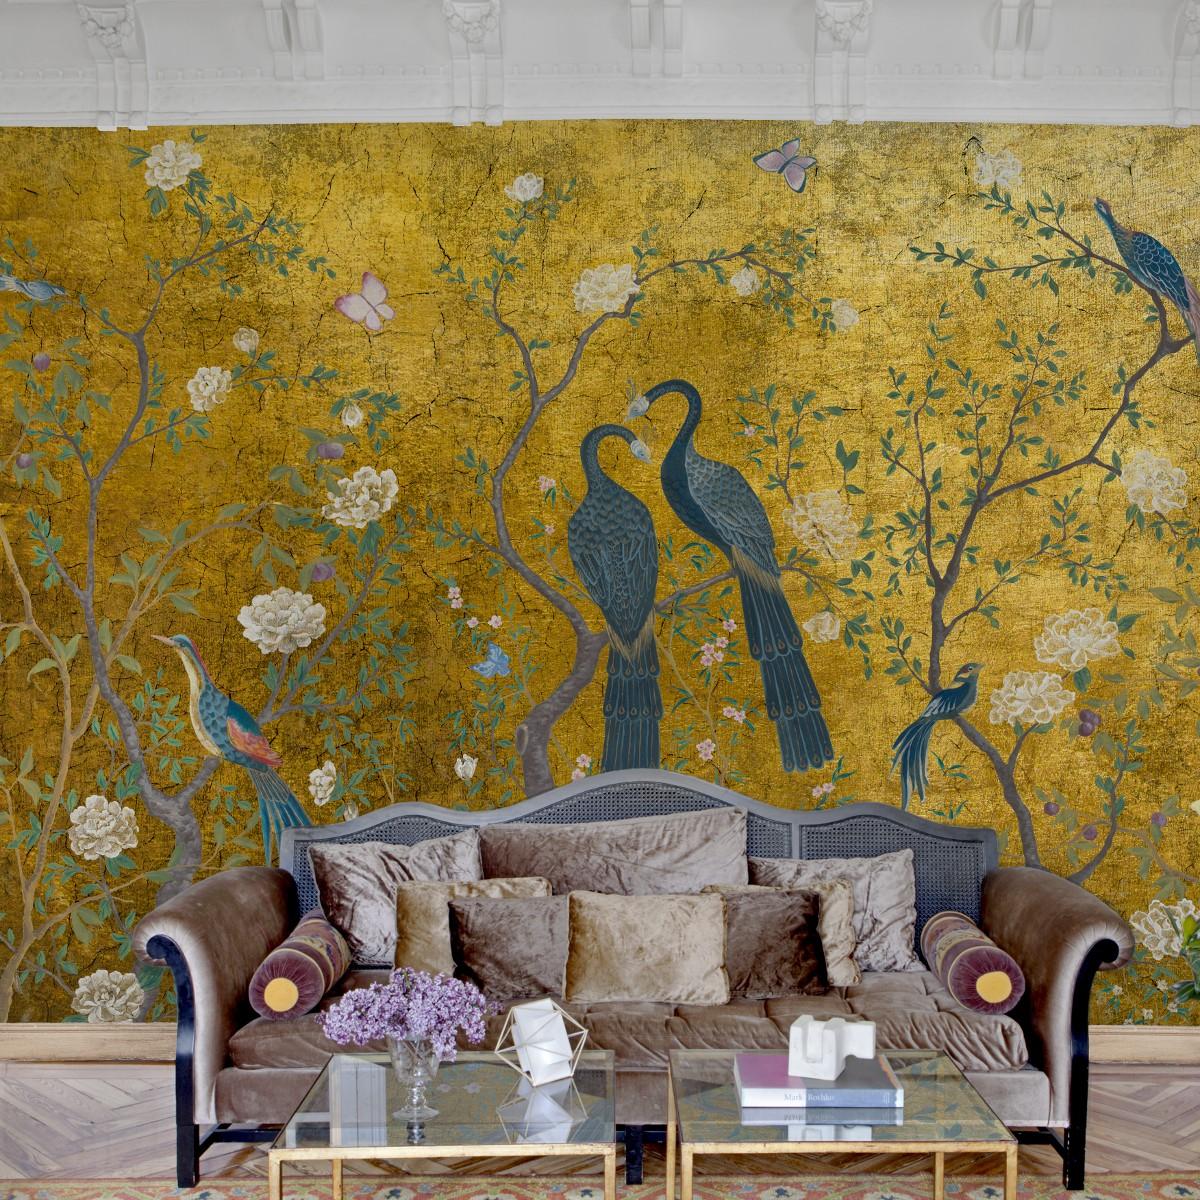 Luxury Chinoiserie Wall Art Motif - Art & Wall Decor - hecatalog.info